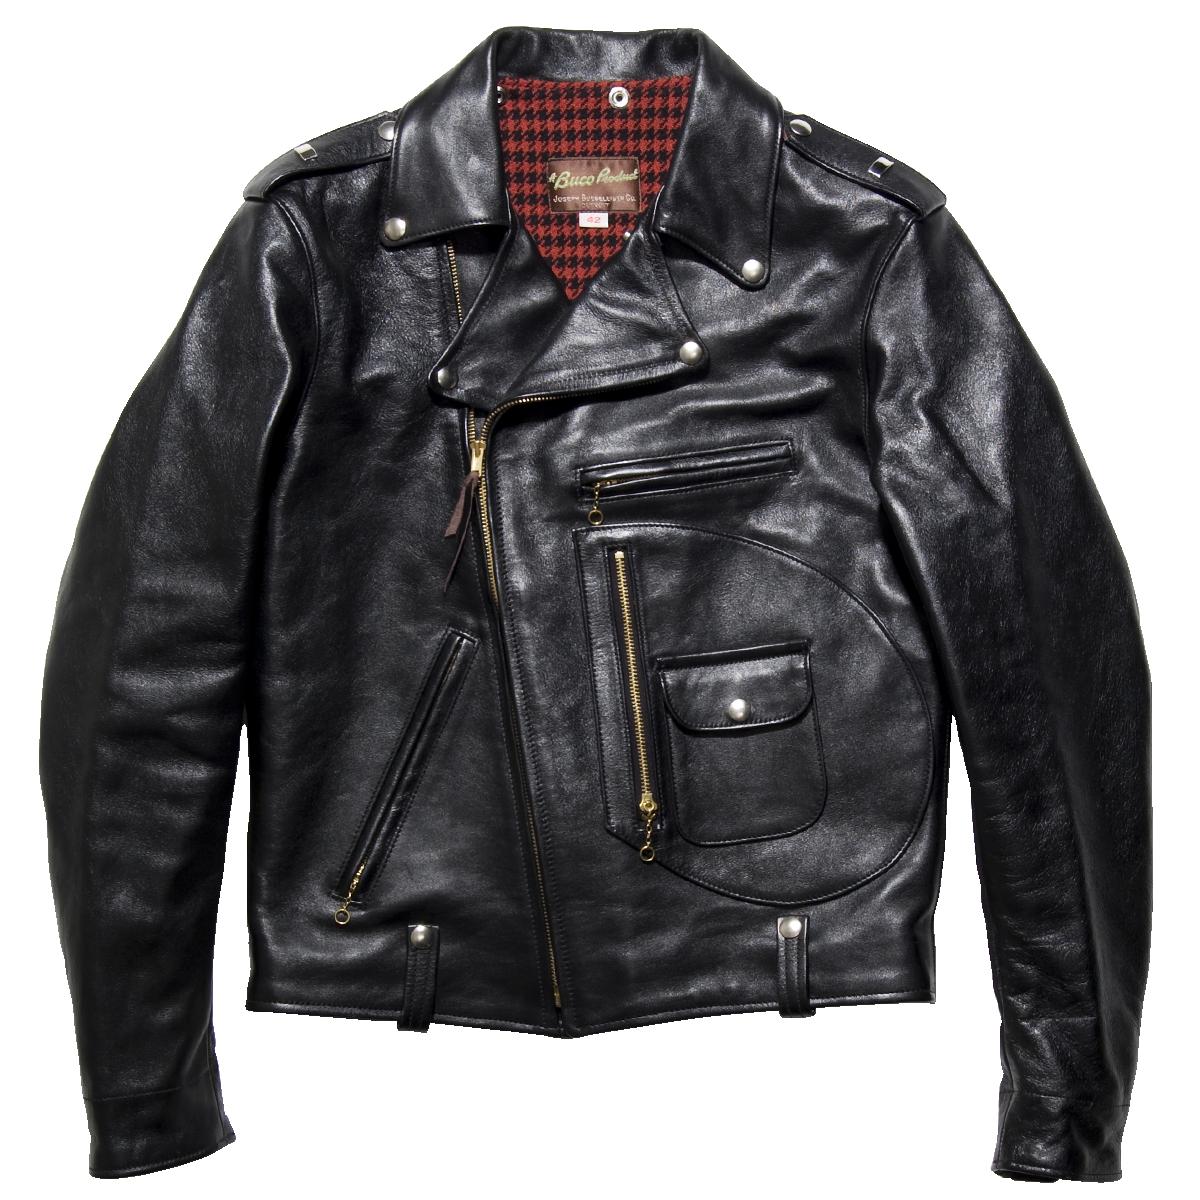 Buco J 22 Horsehide Leather Jacket Leather Jacket Jackets Riders Jacket [ 1200 x 1200 Pixel ]